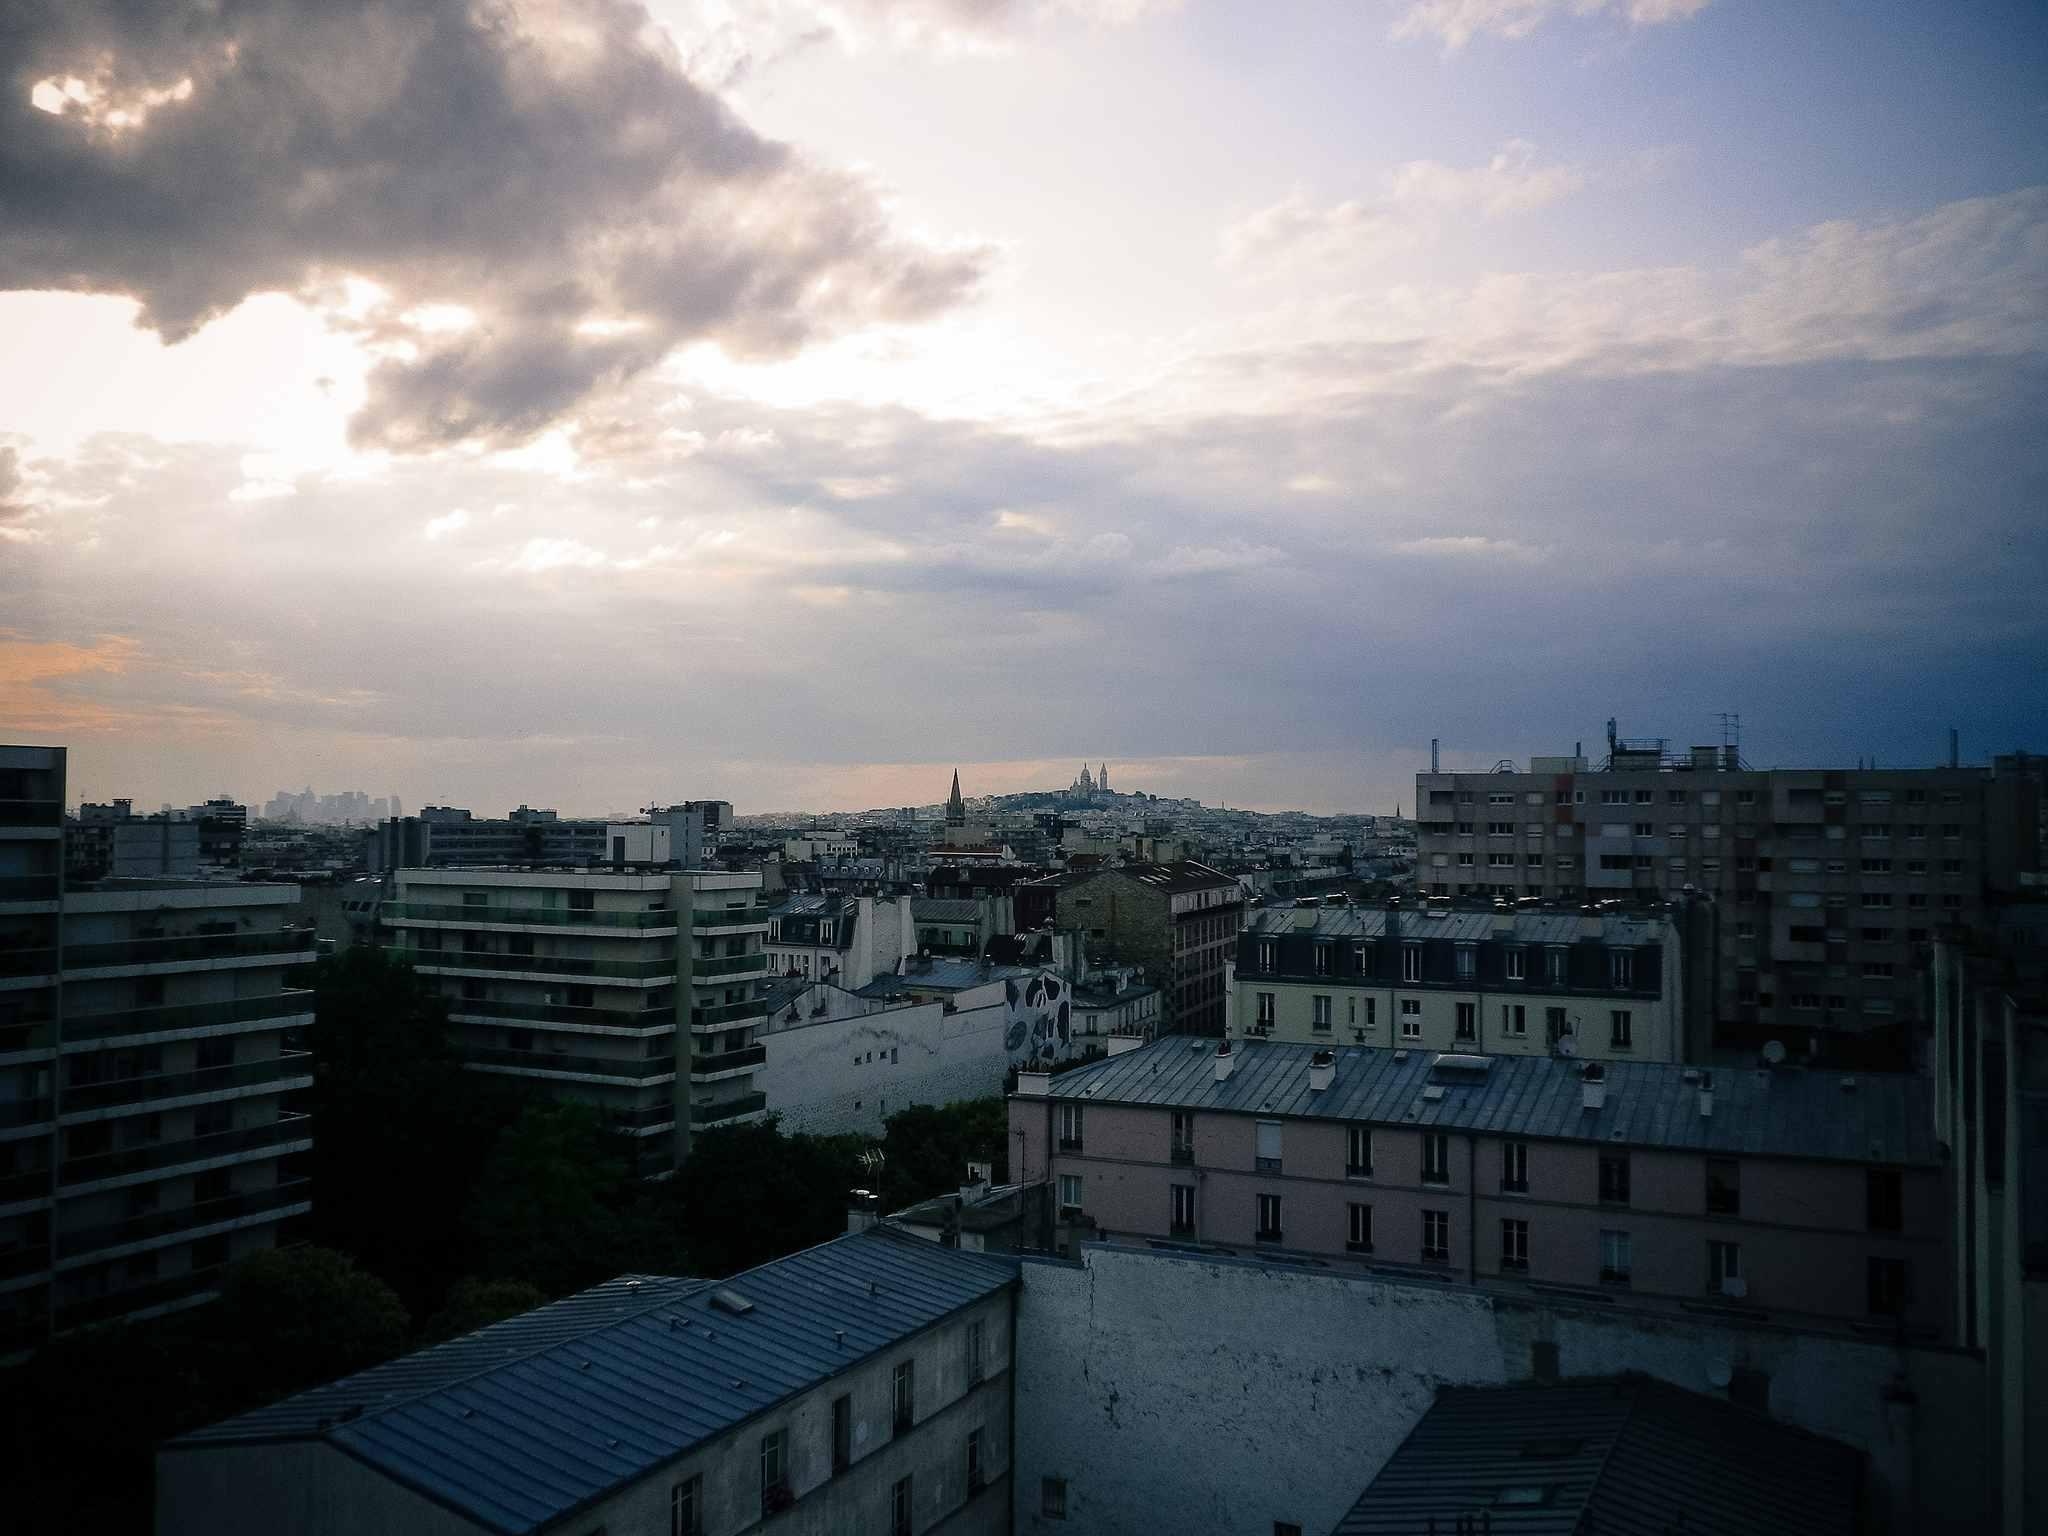 Vista desde le Perchoir, París